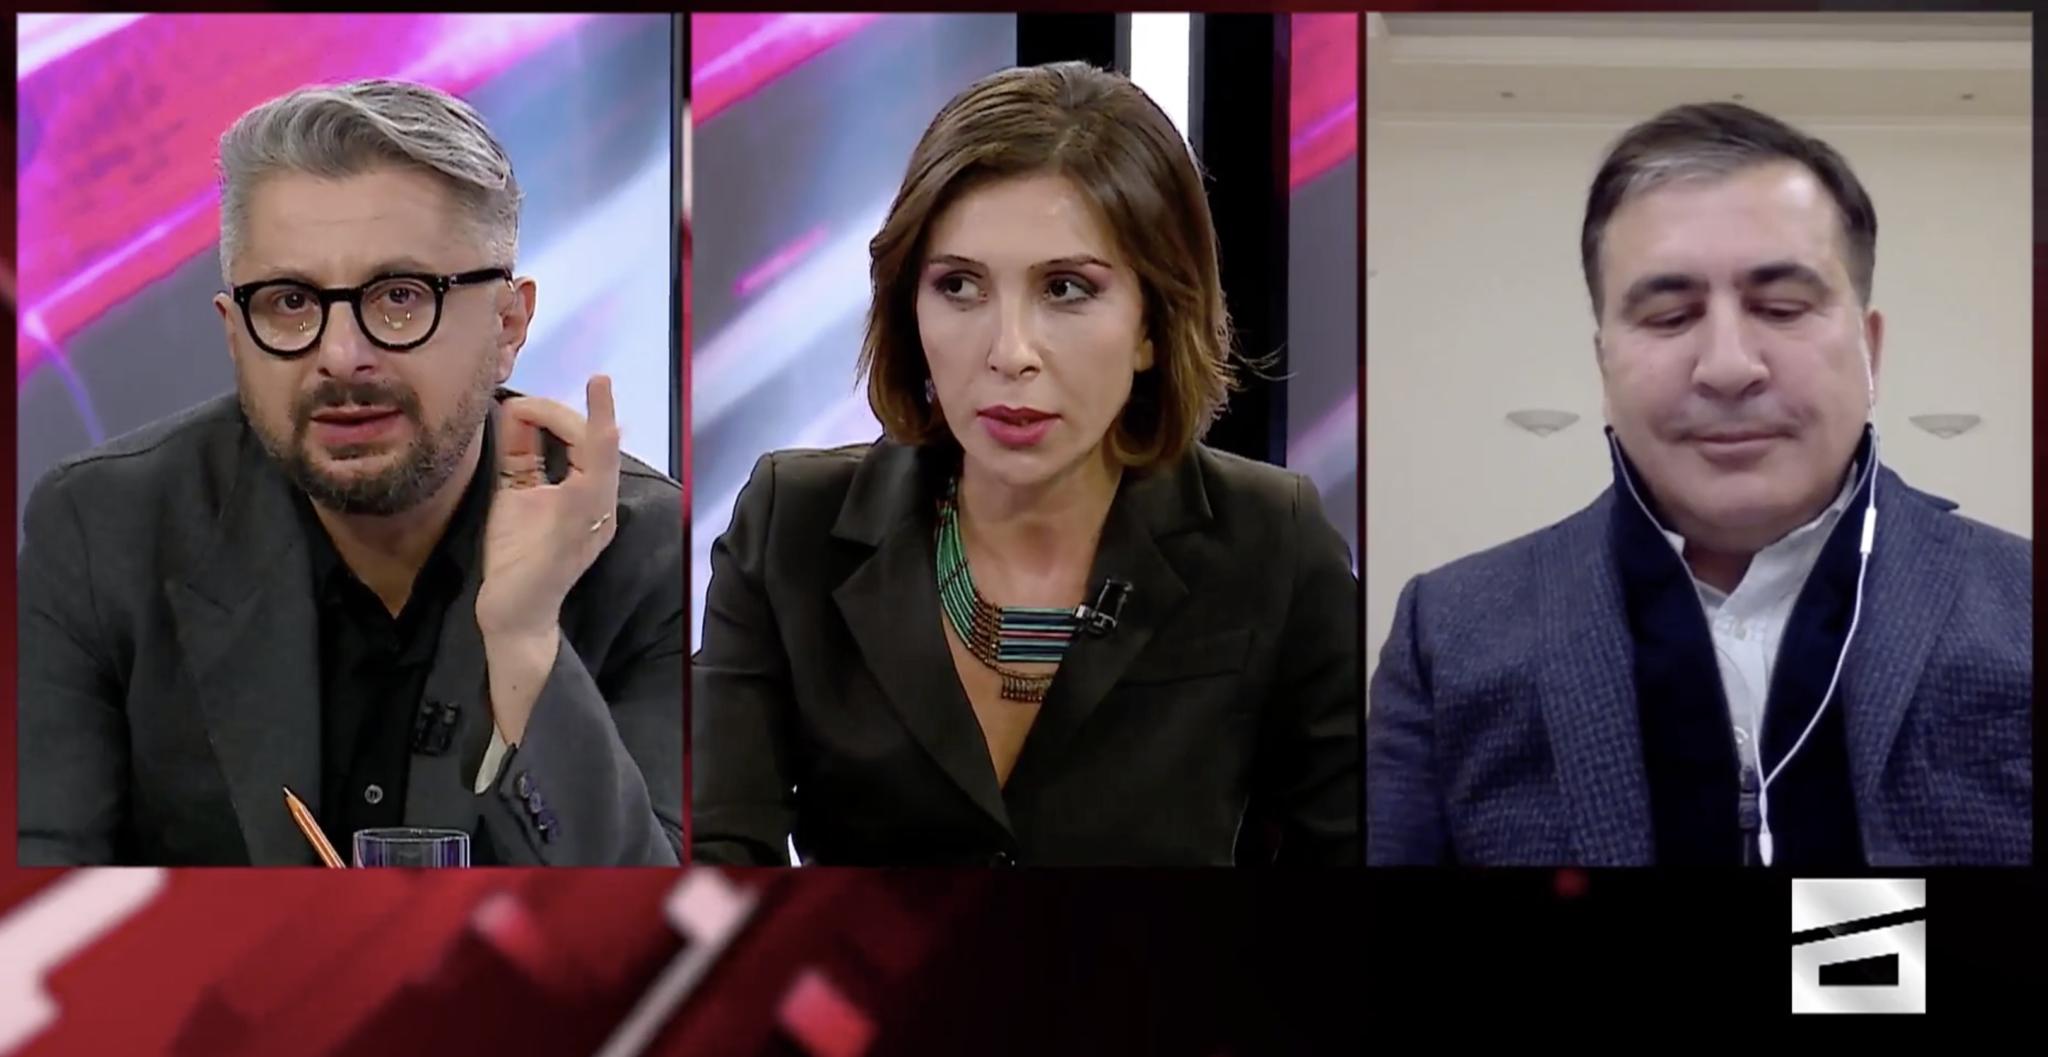 Mikheil Saakashvili, Nika Gvaramia, Eka Kvesitadzeმიხეილ სააკაშვილი, ნიკა გვარამია, ეკა კვესიტაძე